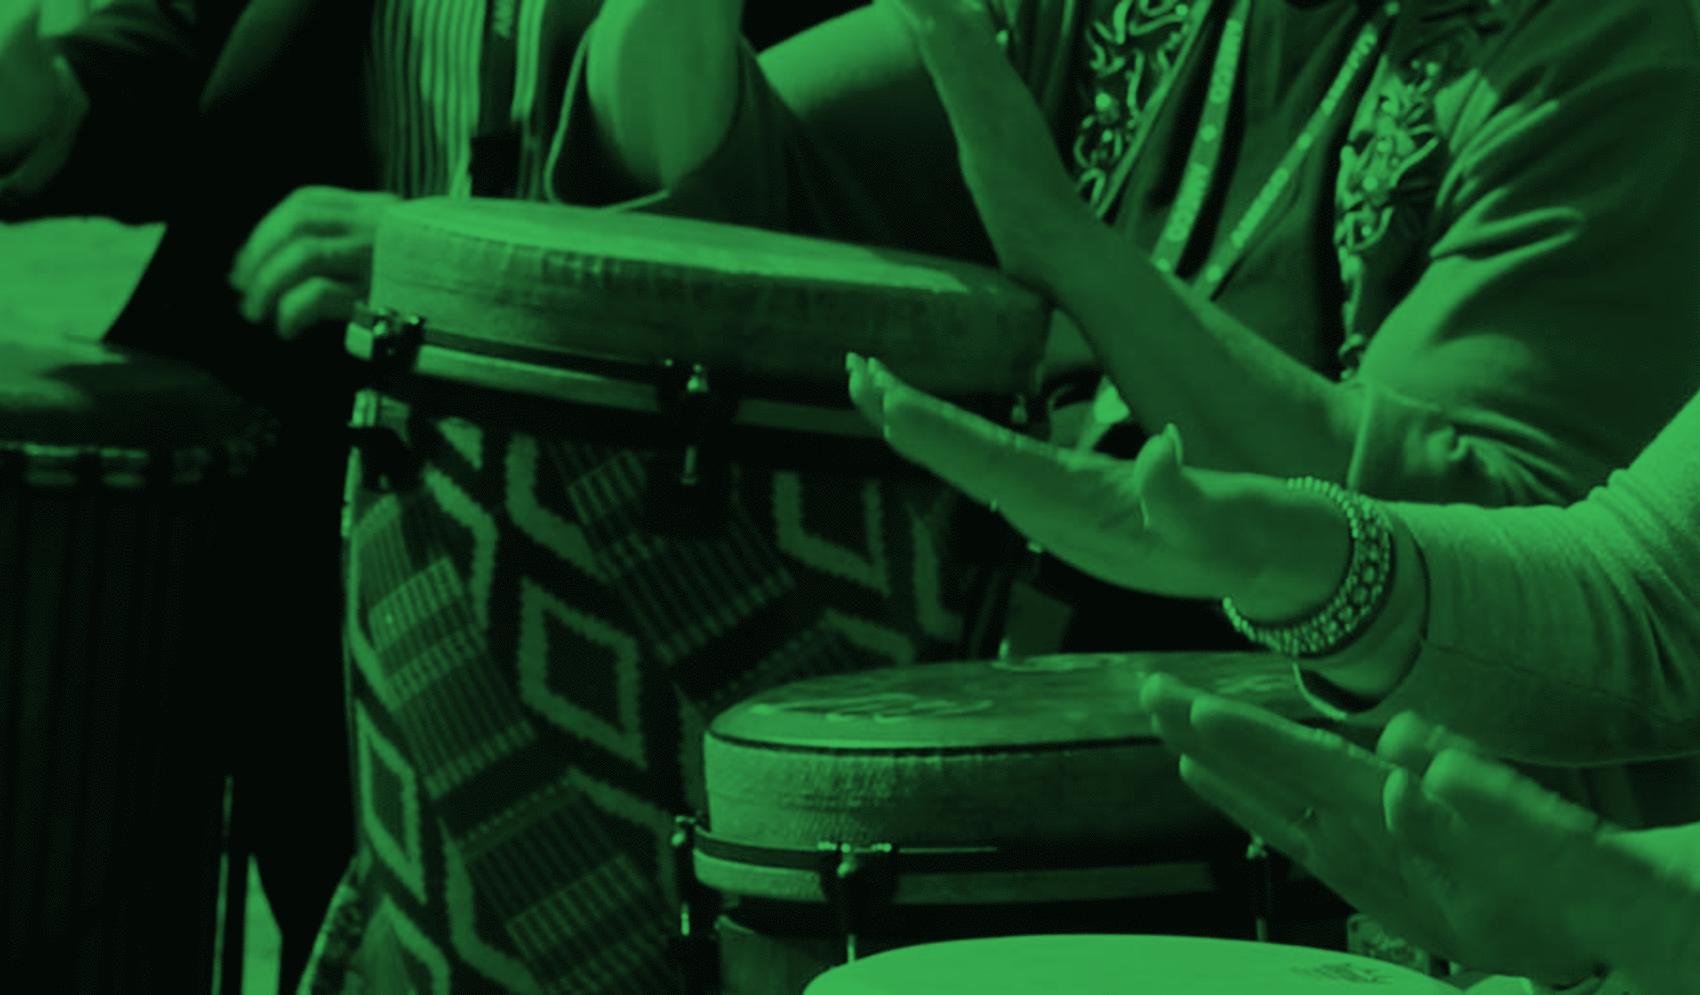 Hands-on Drumming